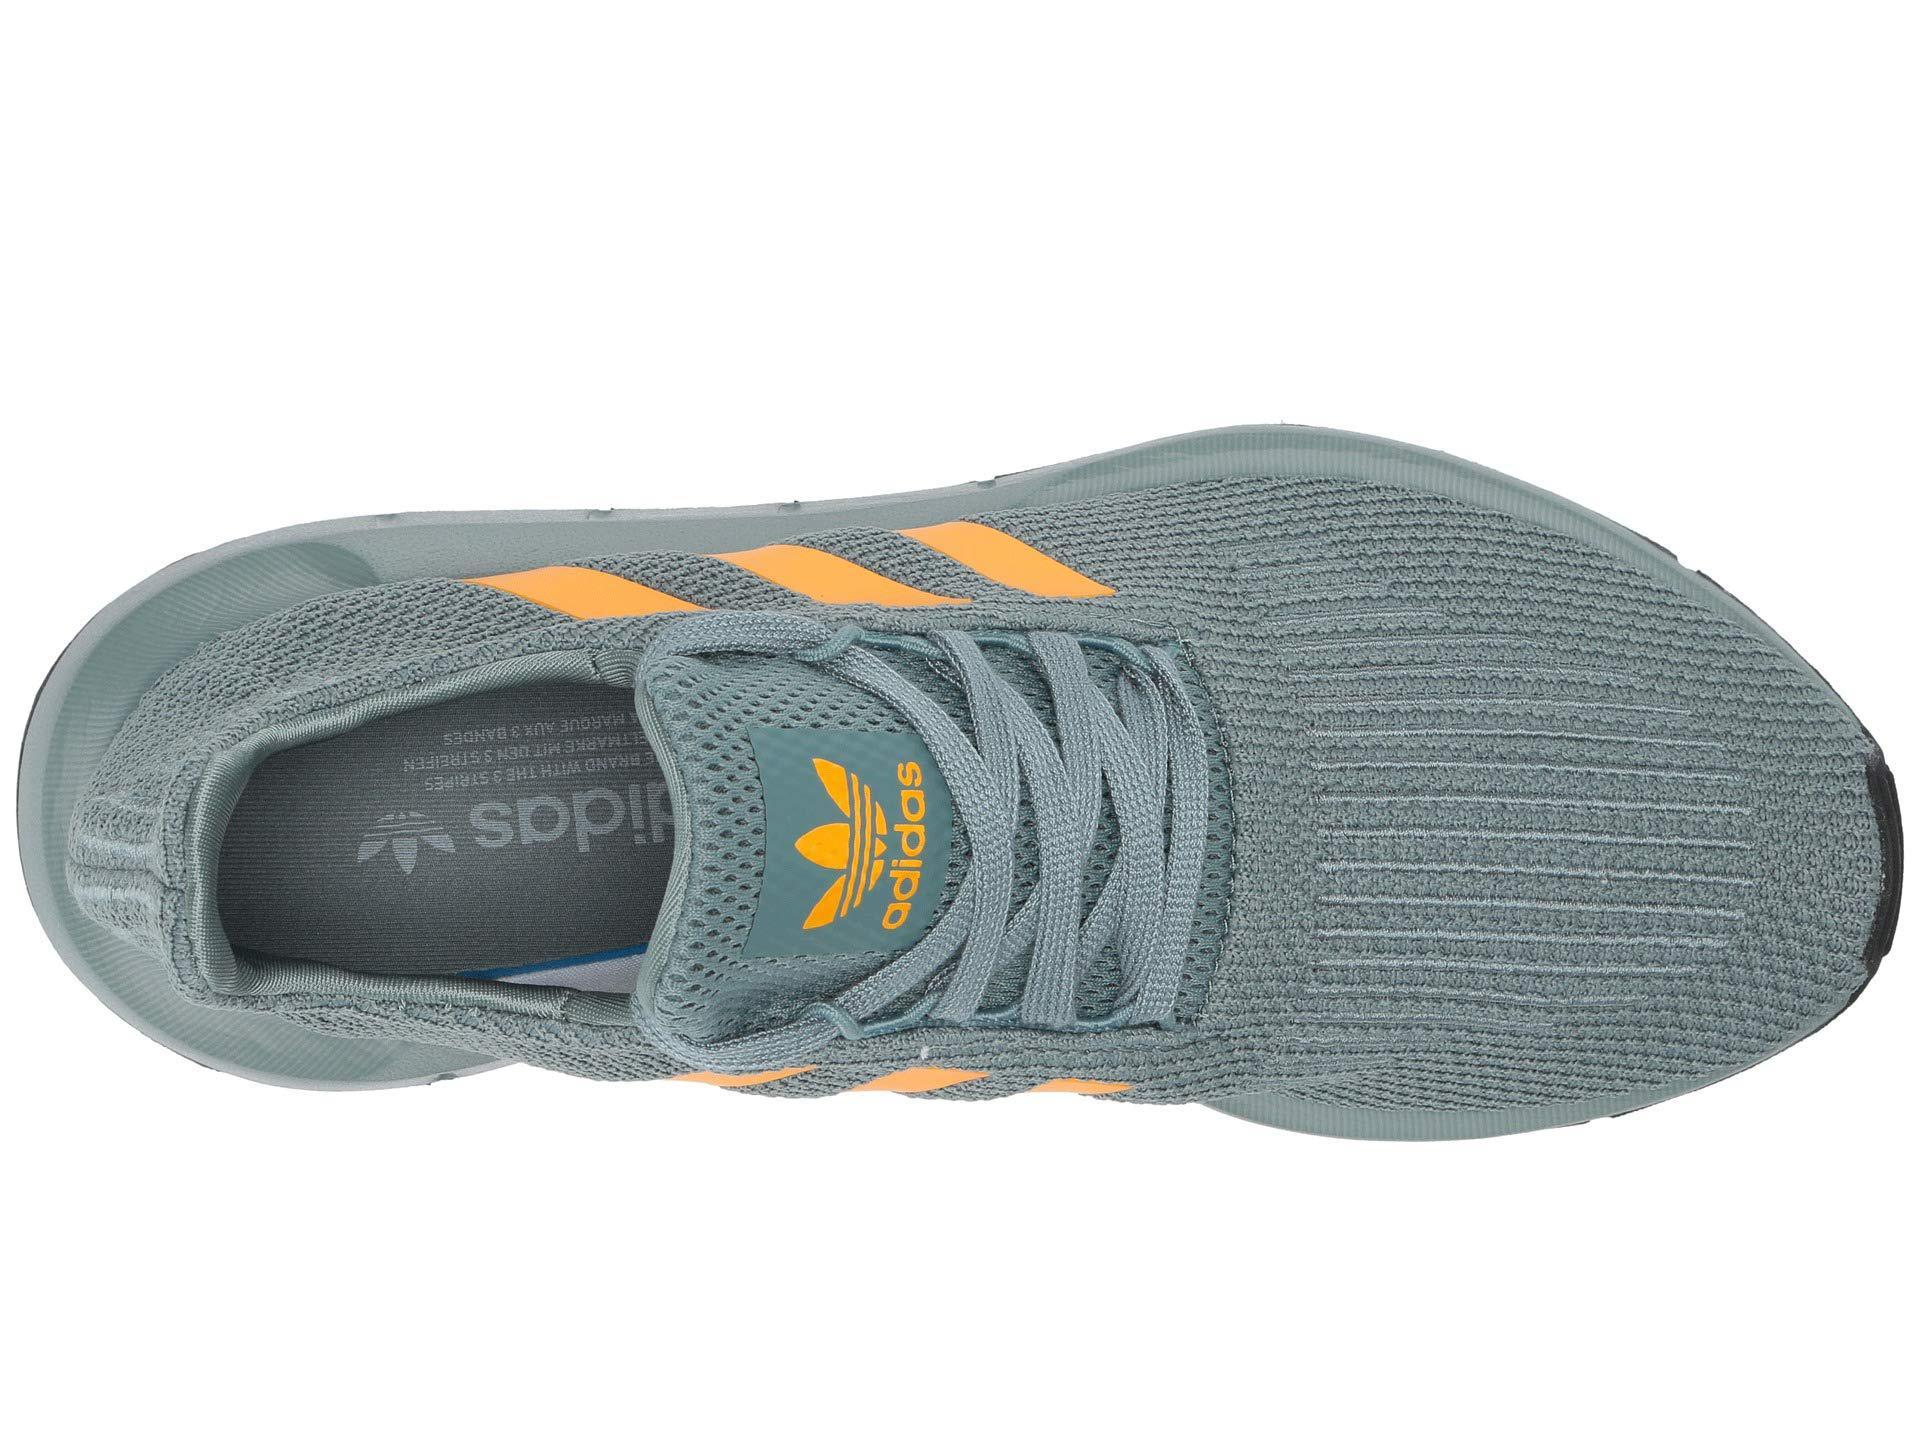 1d6ce600e Lyst - adidas Originals Swift Run (raw Green real Gold core Black ...